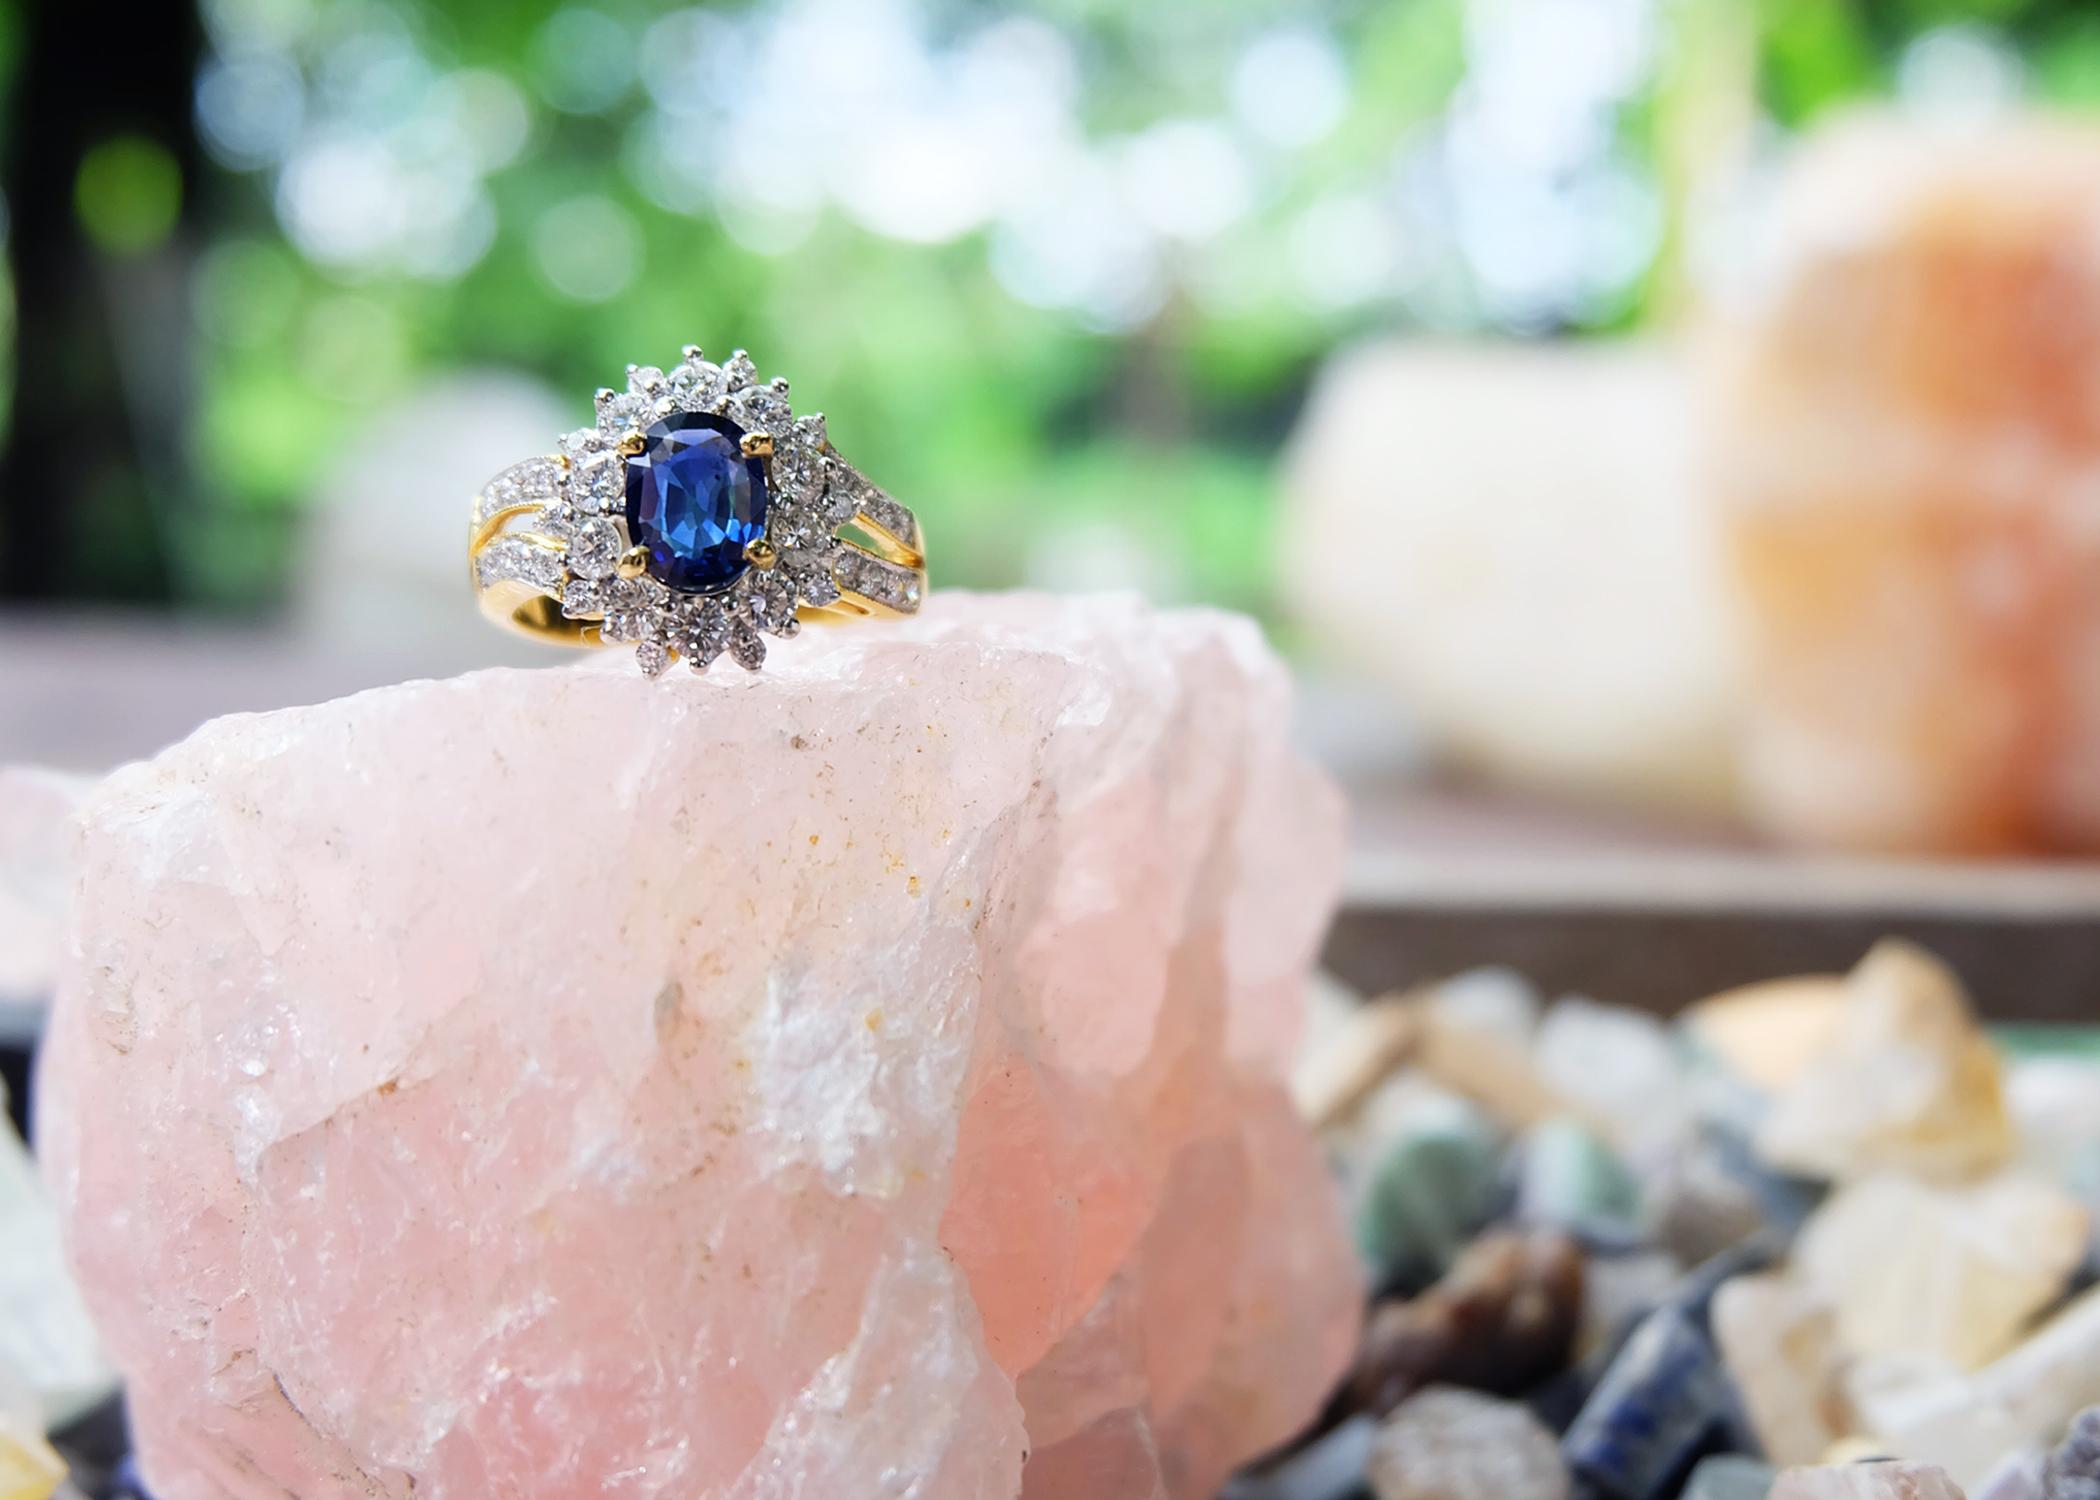 Brightening blue sapphire